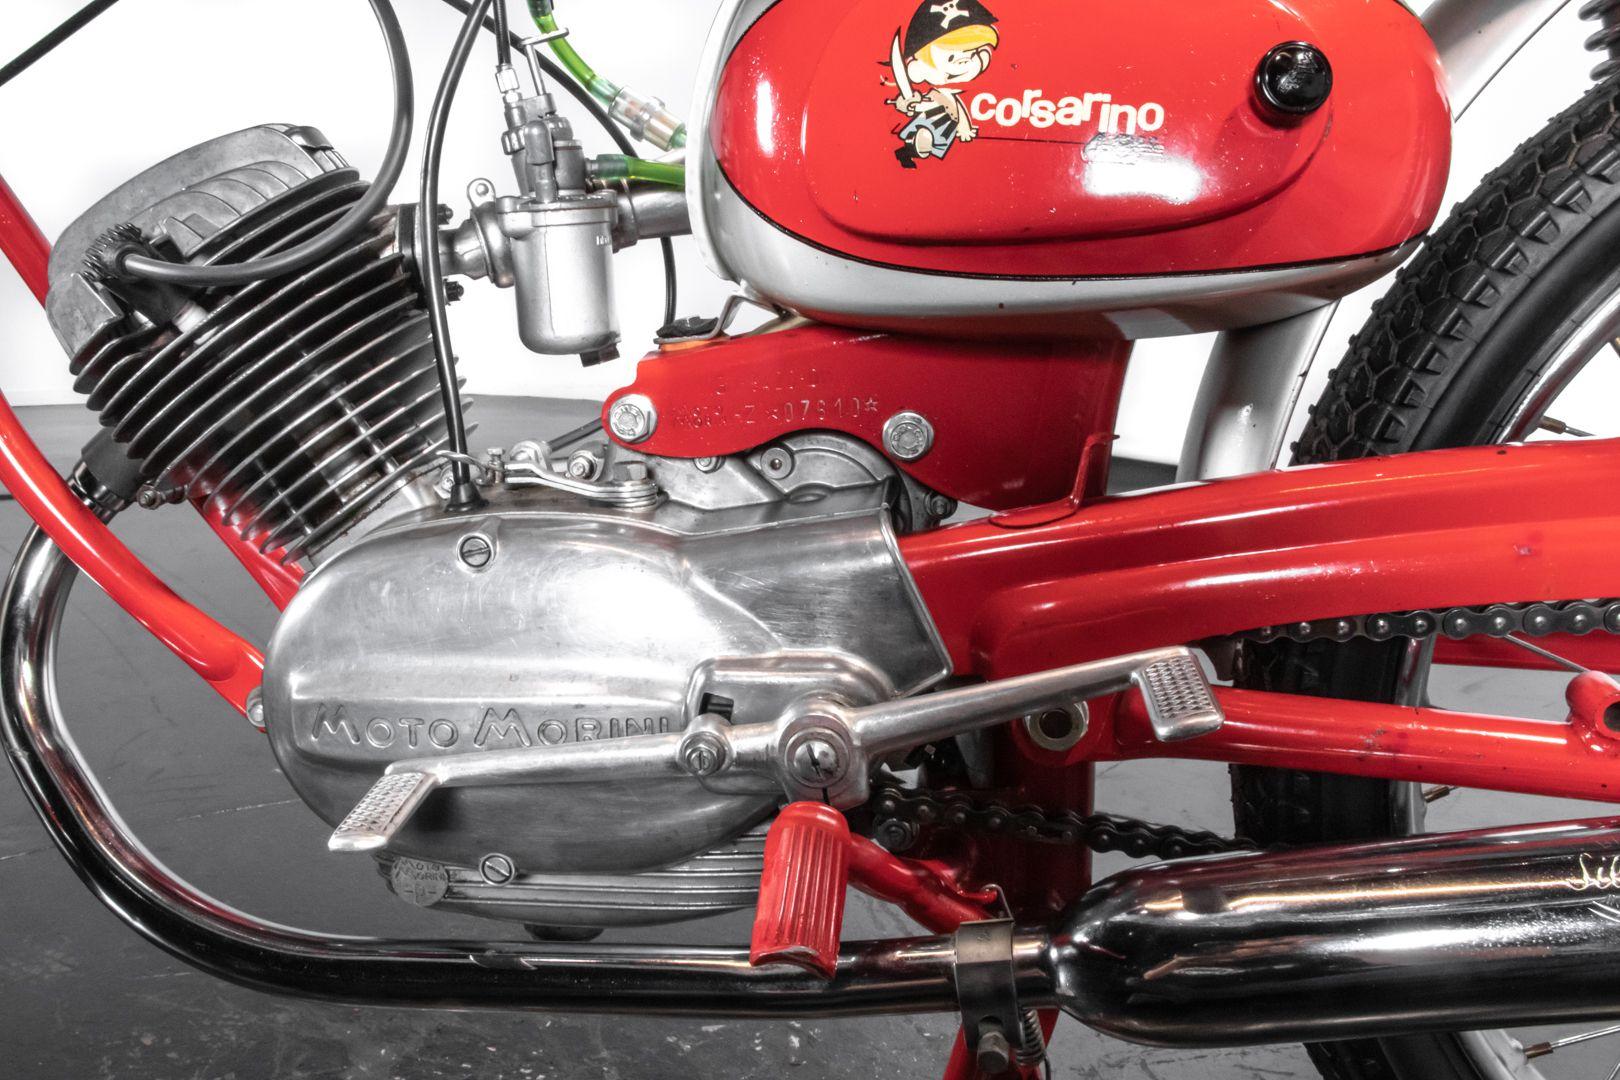 1965 Moto Morini Corsarino Z 77579